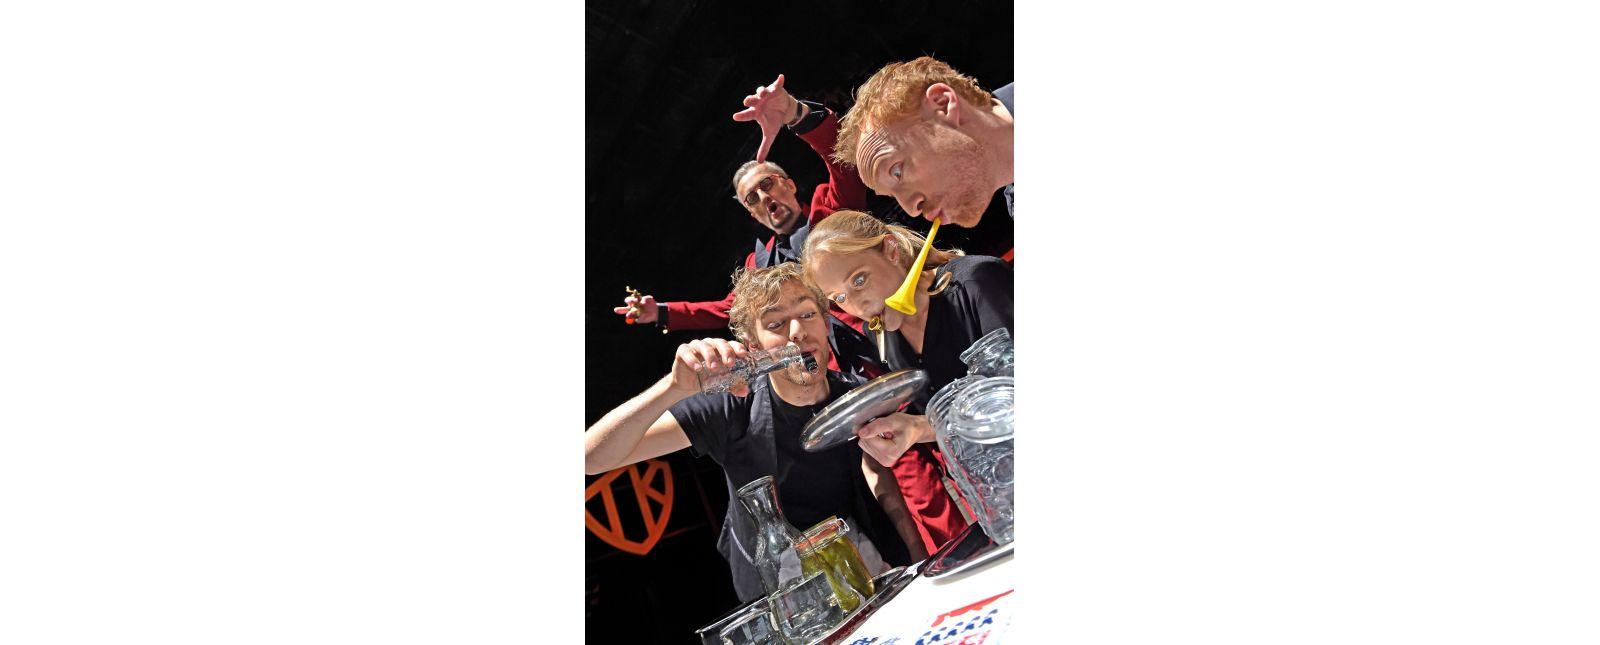 Teufels Küche // Justin Auer, Klaus Simon, Mariella Bachmann, Philipp Schiemenz // 2017 // Foto: Maurice Korbel